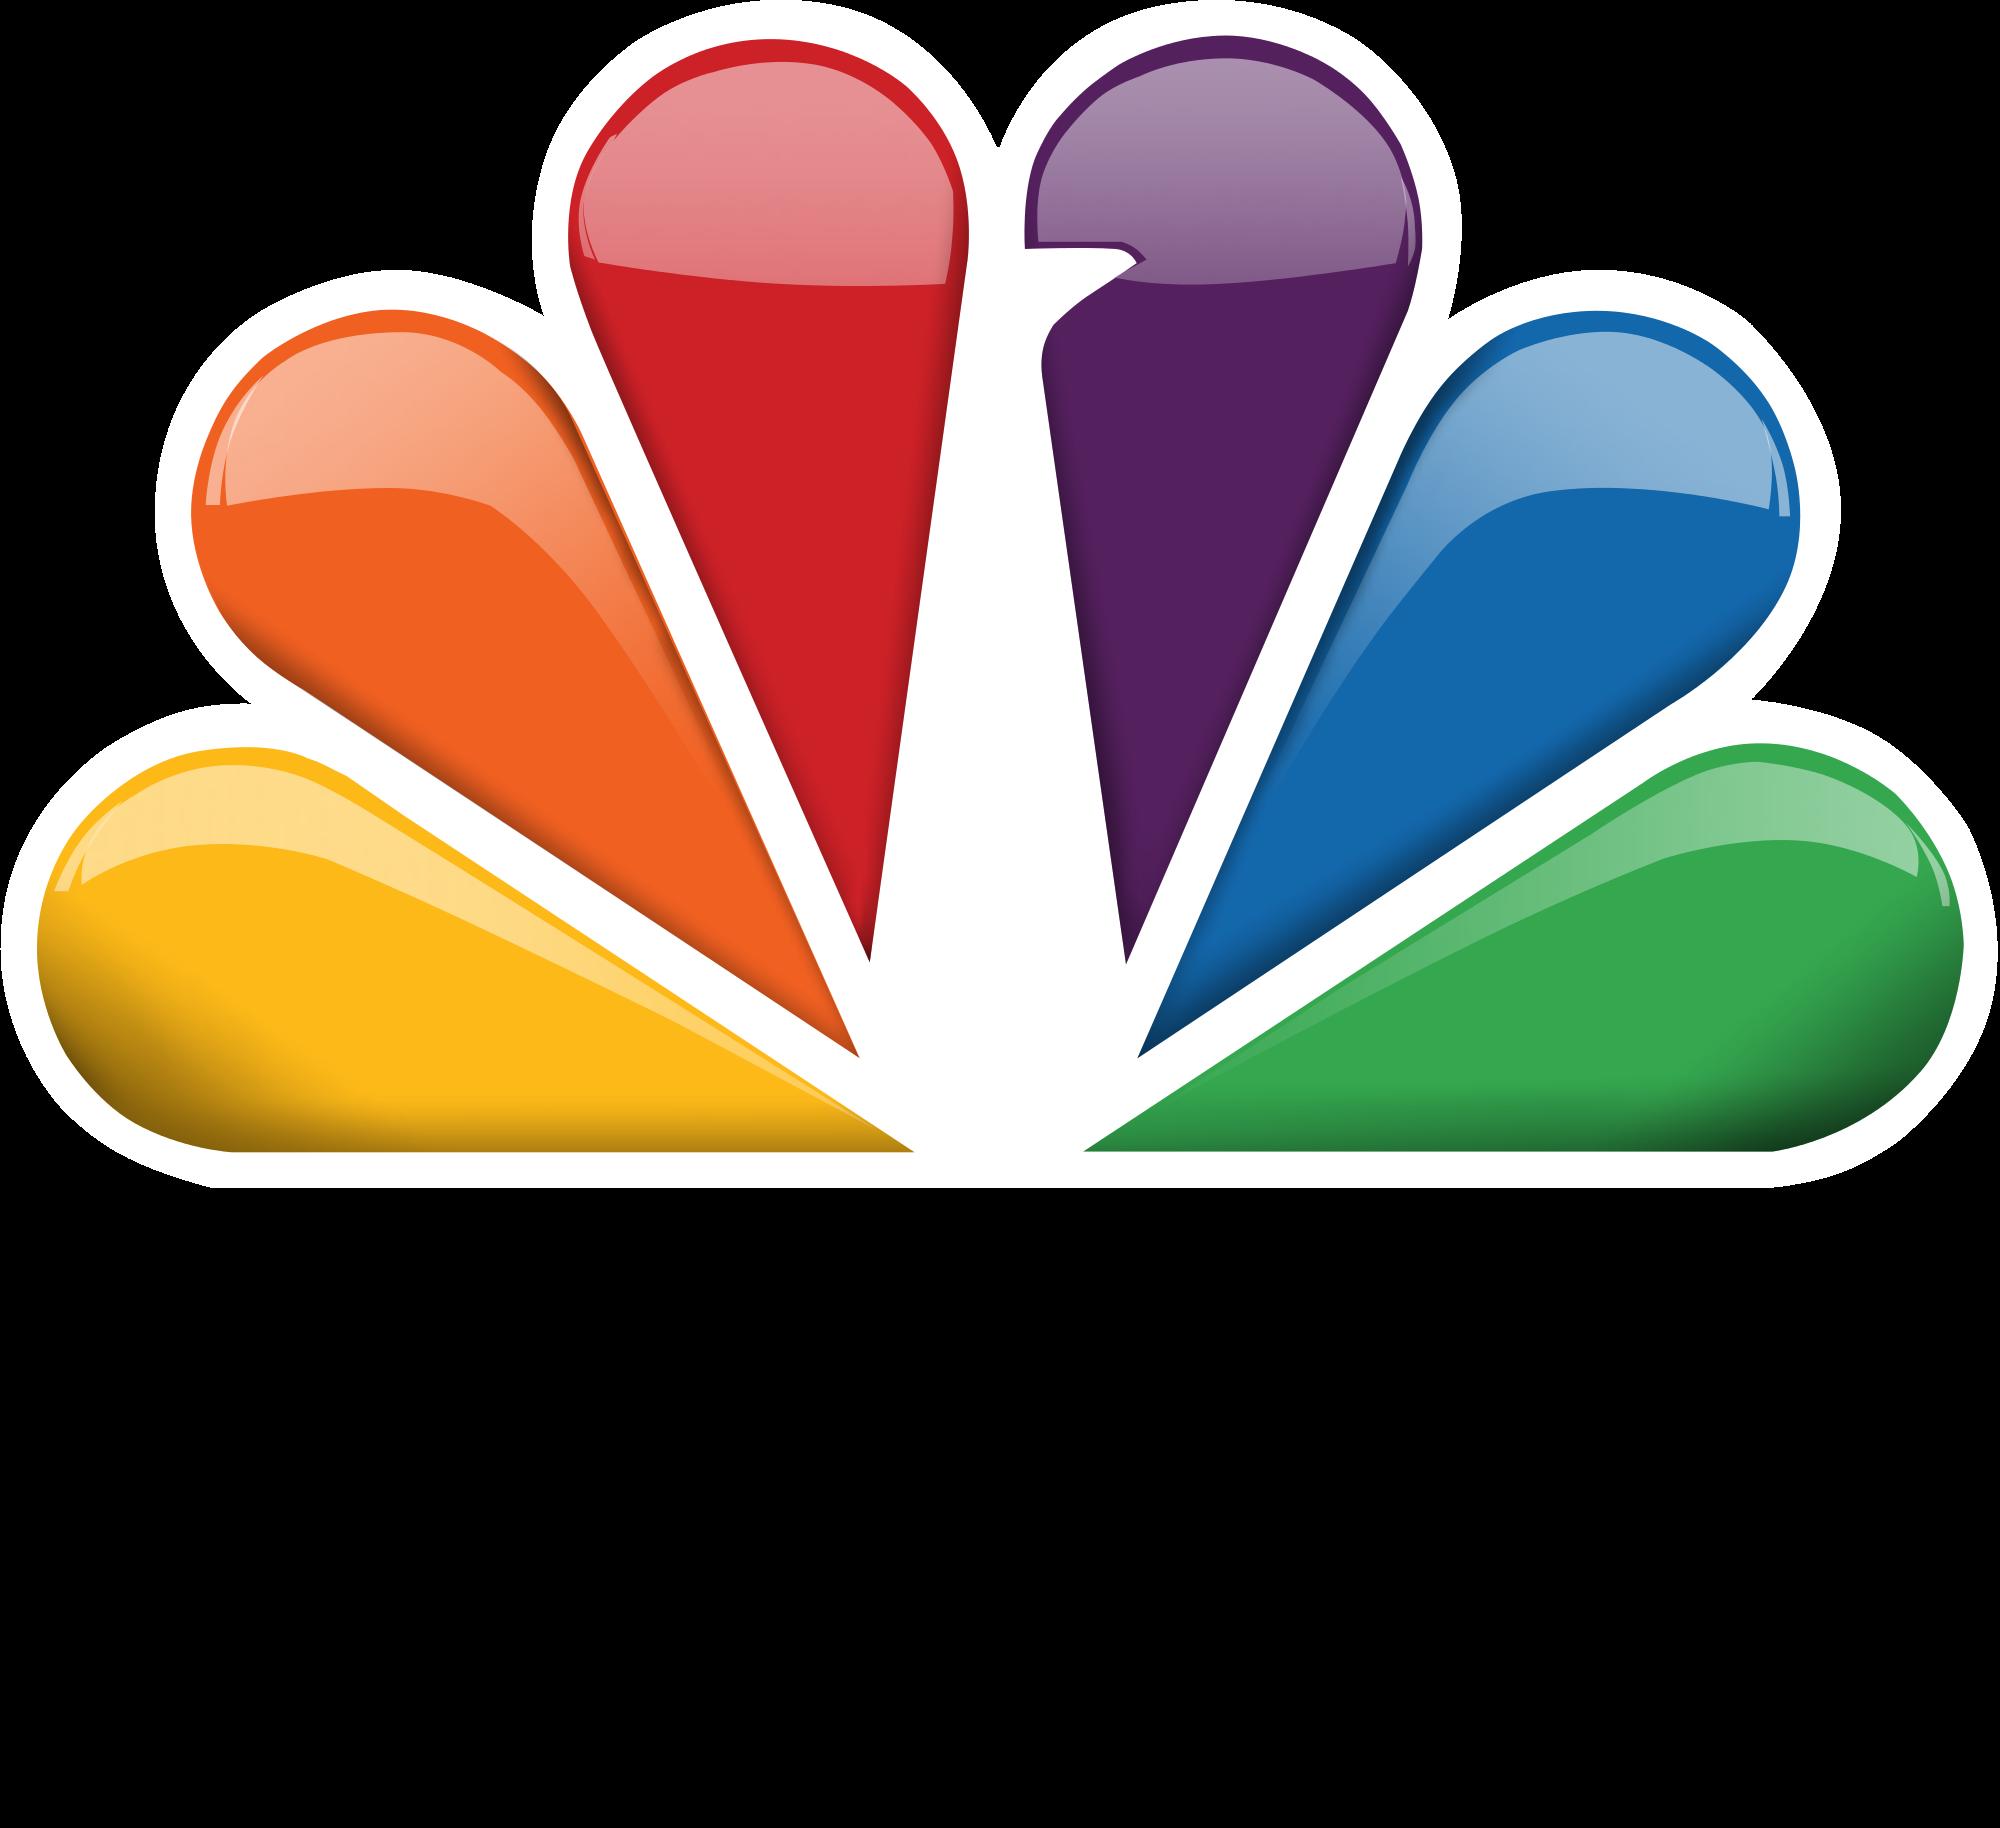 Nbc_logo-7.png